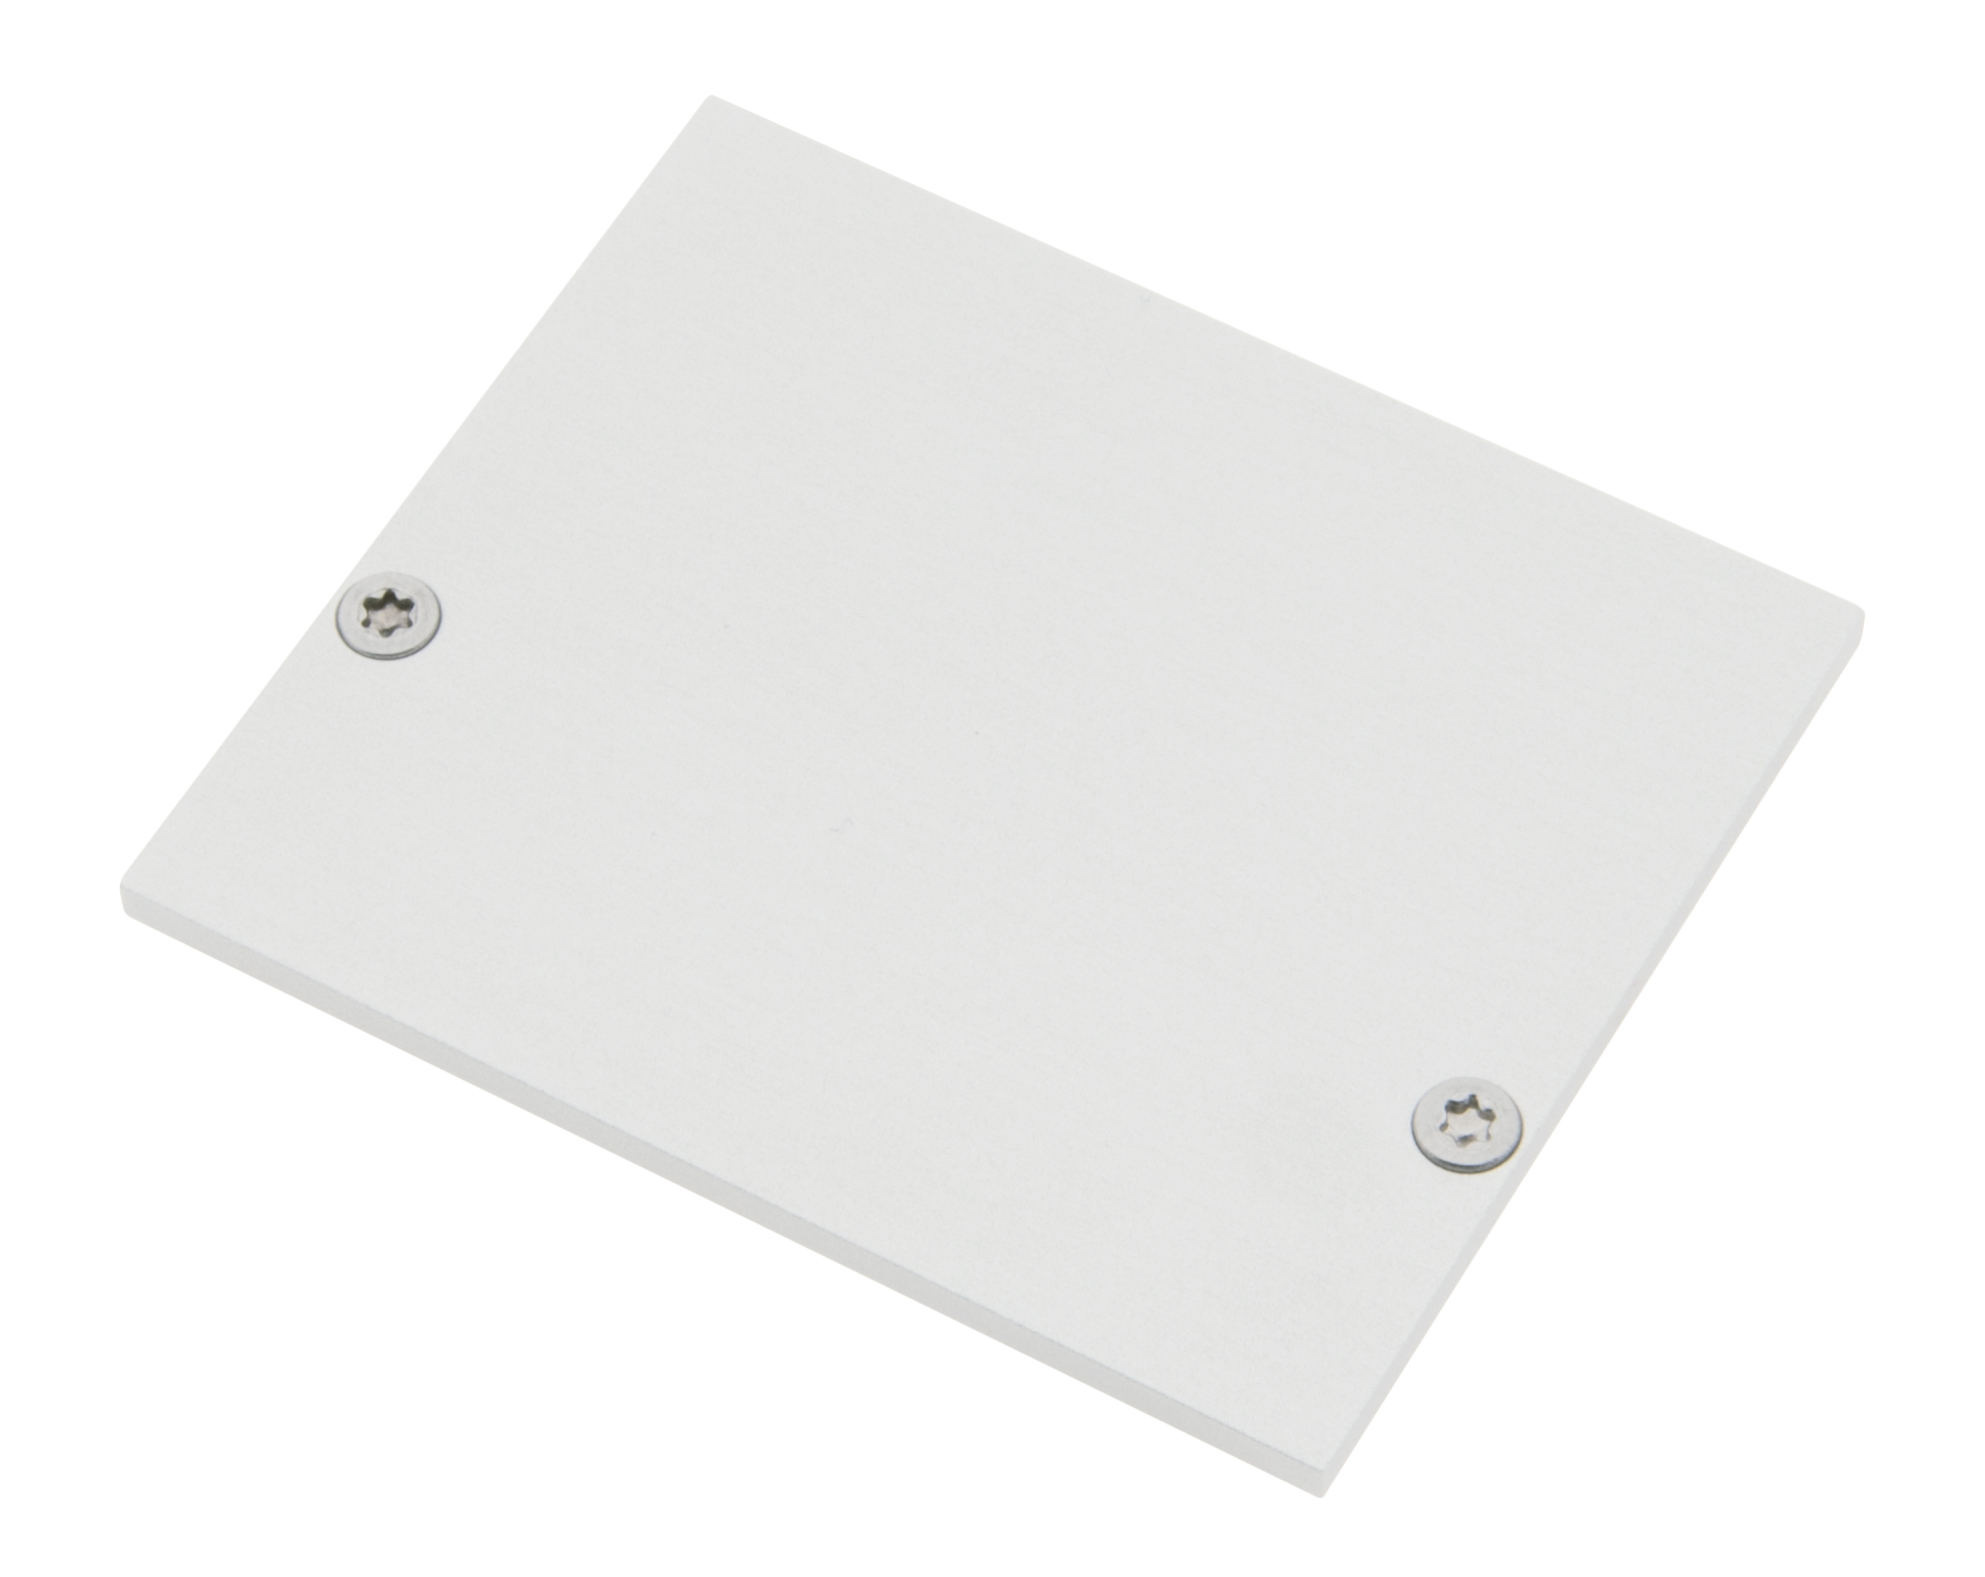 1 Stk Profil Endkappe SLA Eckig geschlossen inkl. Schrauben LIEK003220